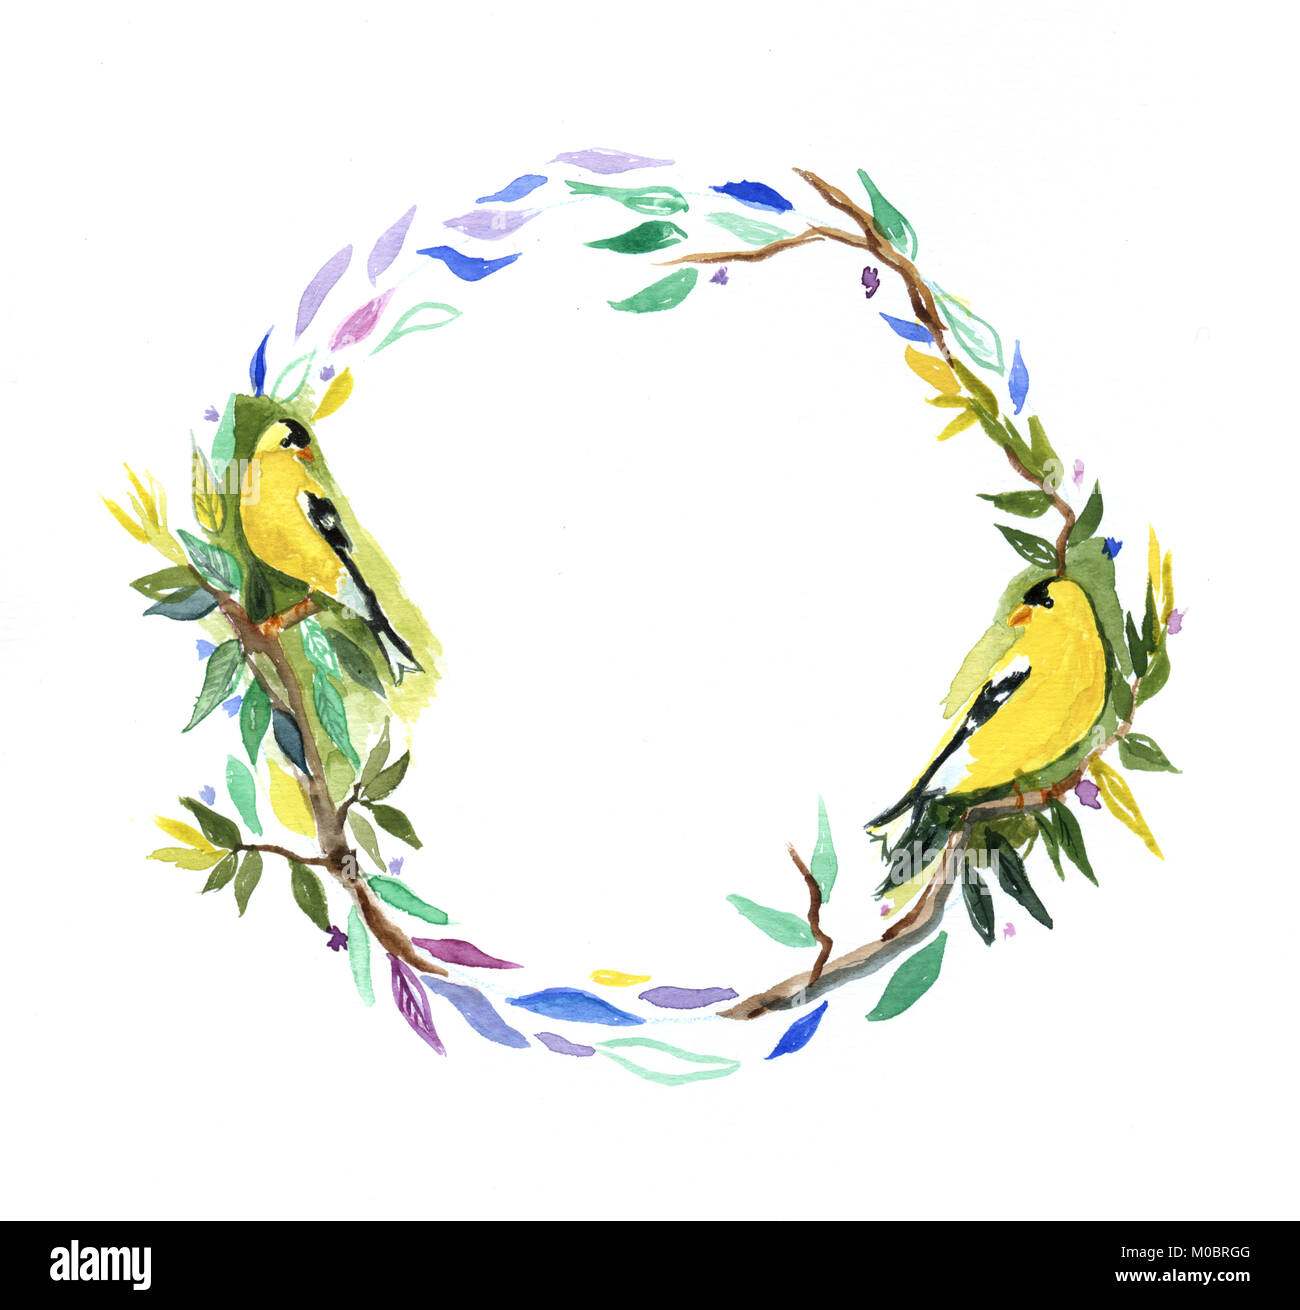 Aquarell Vögel Rahmen handmade auf Papier. Aquarelle perfekt für ...